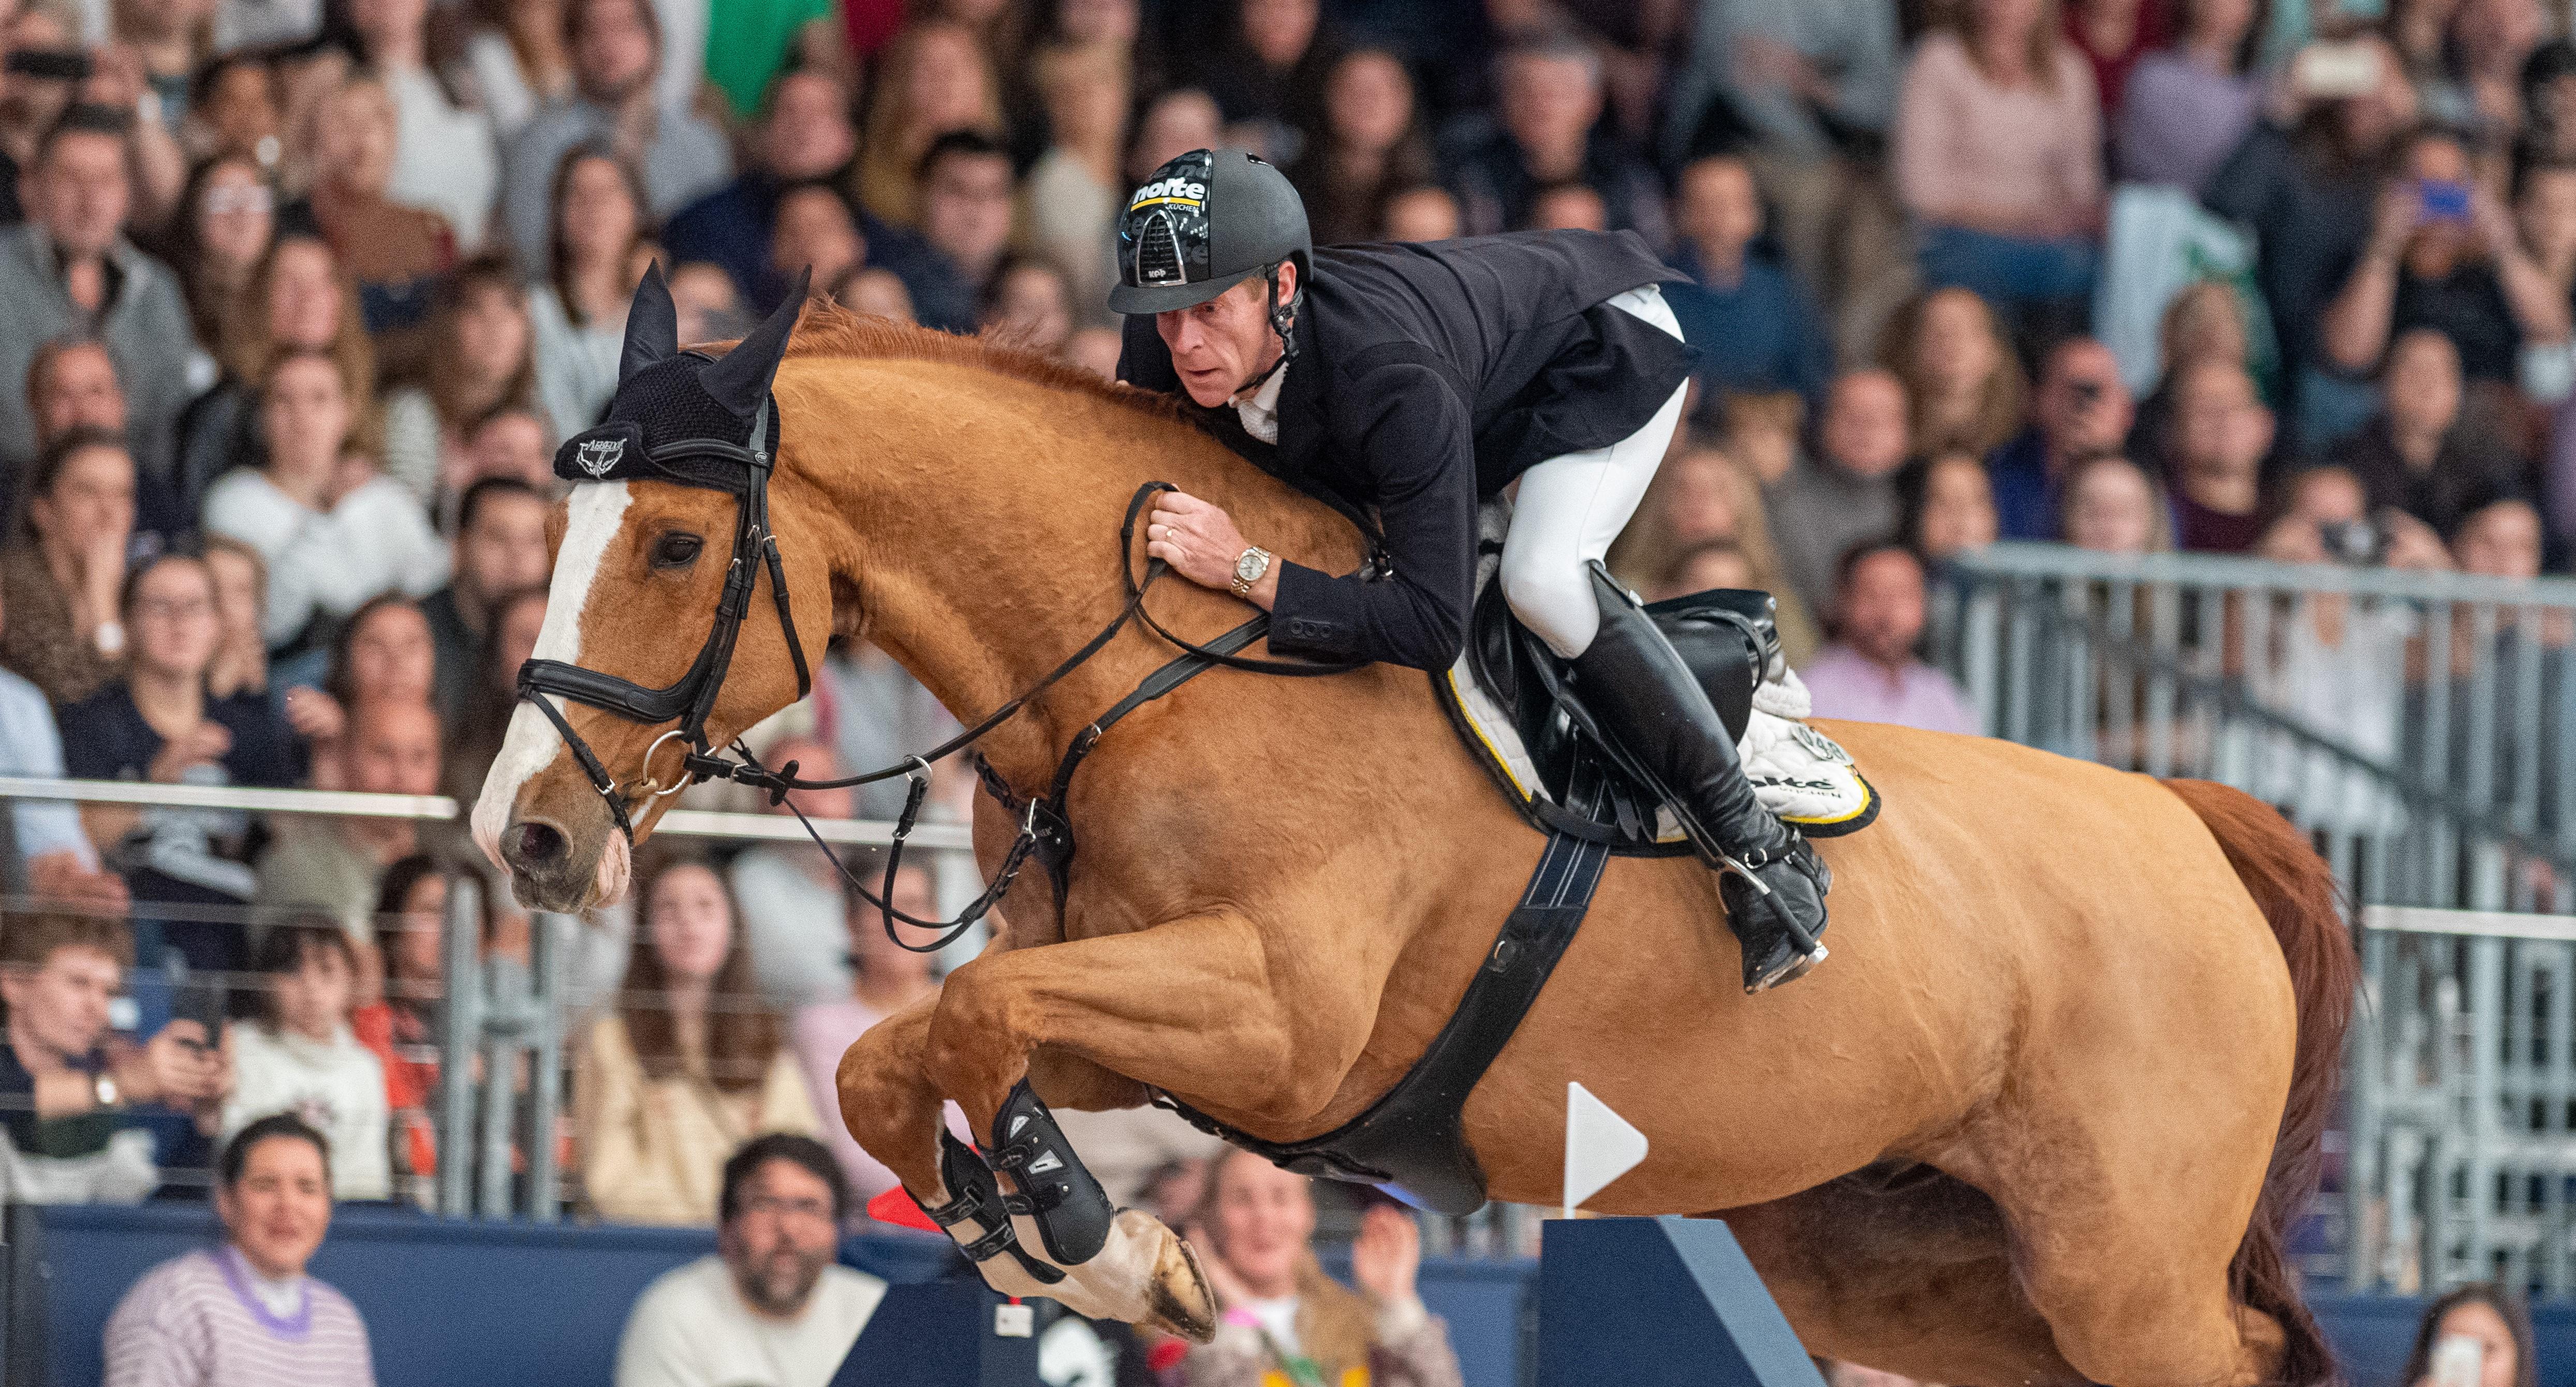 Madrid: Marcus Ehning Sieger im Weltcup